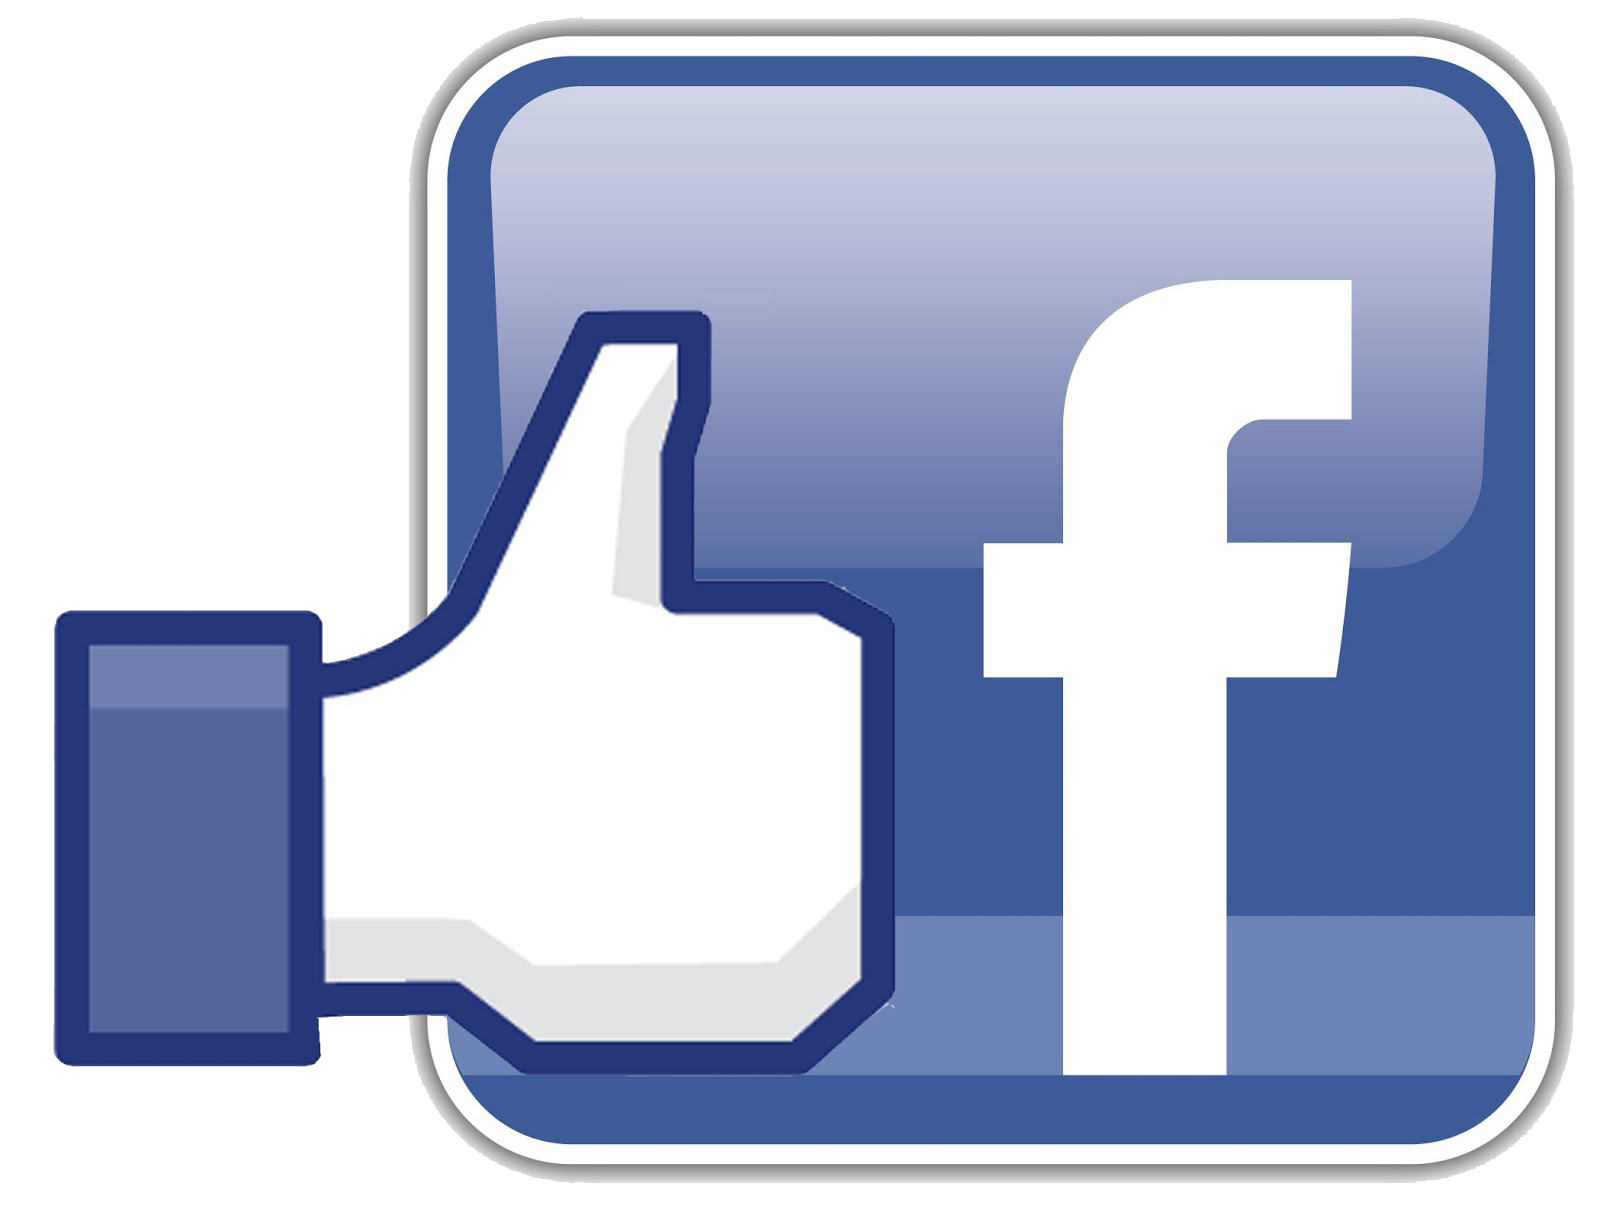 Facebook Logo Png 2 Oklacozy 2015